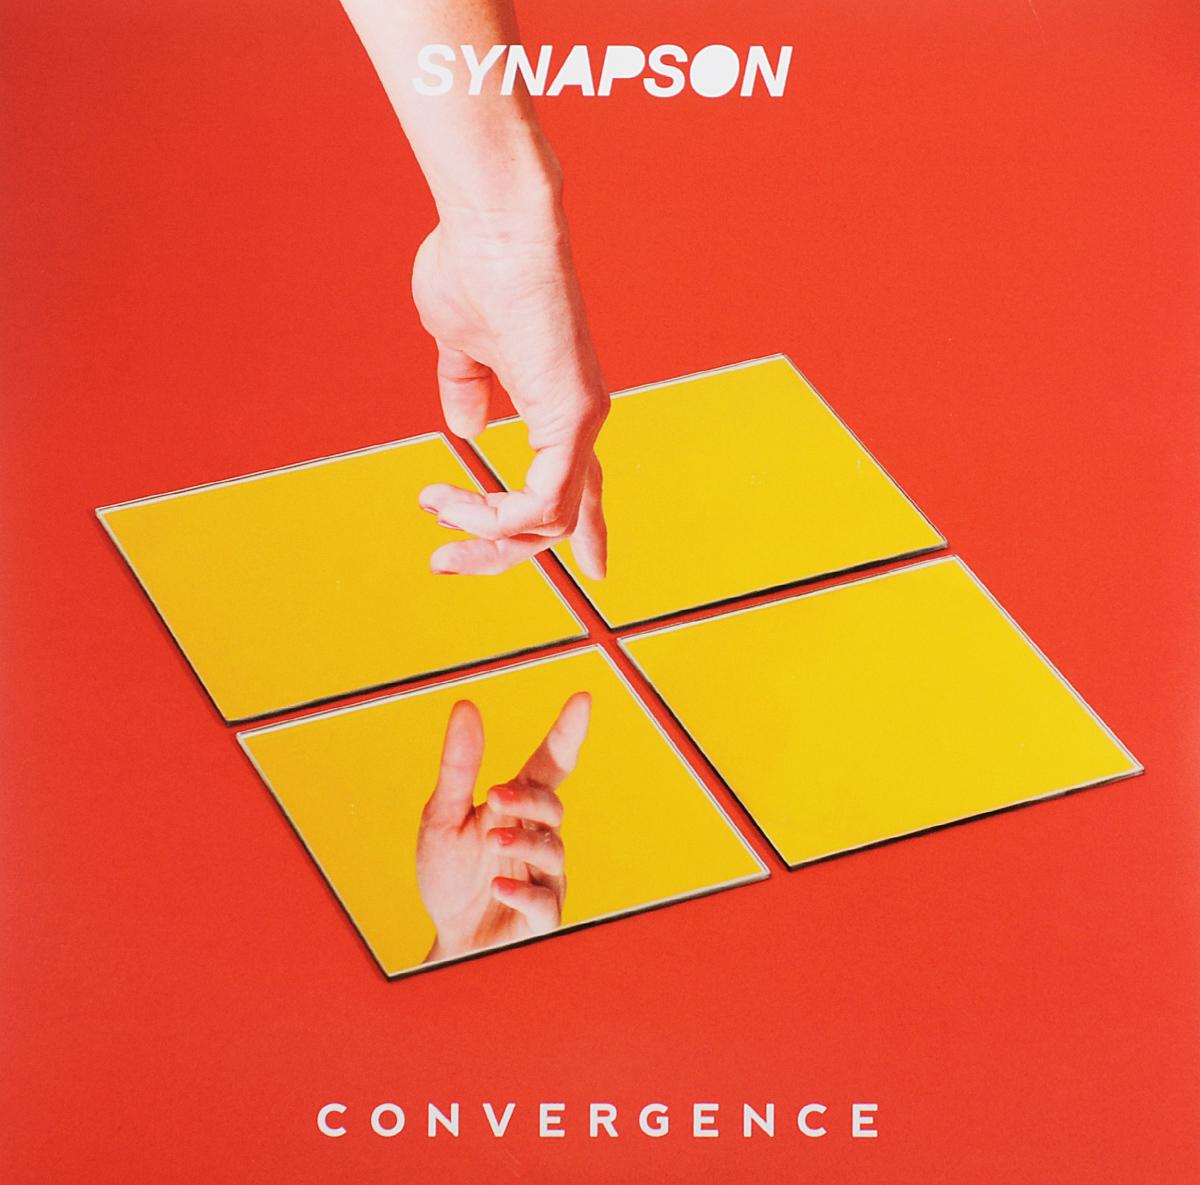 Synapson. Convergence (2 LP)